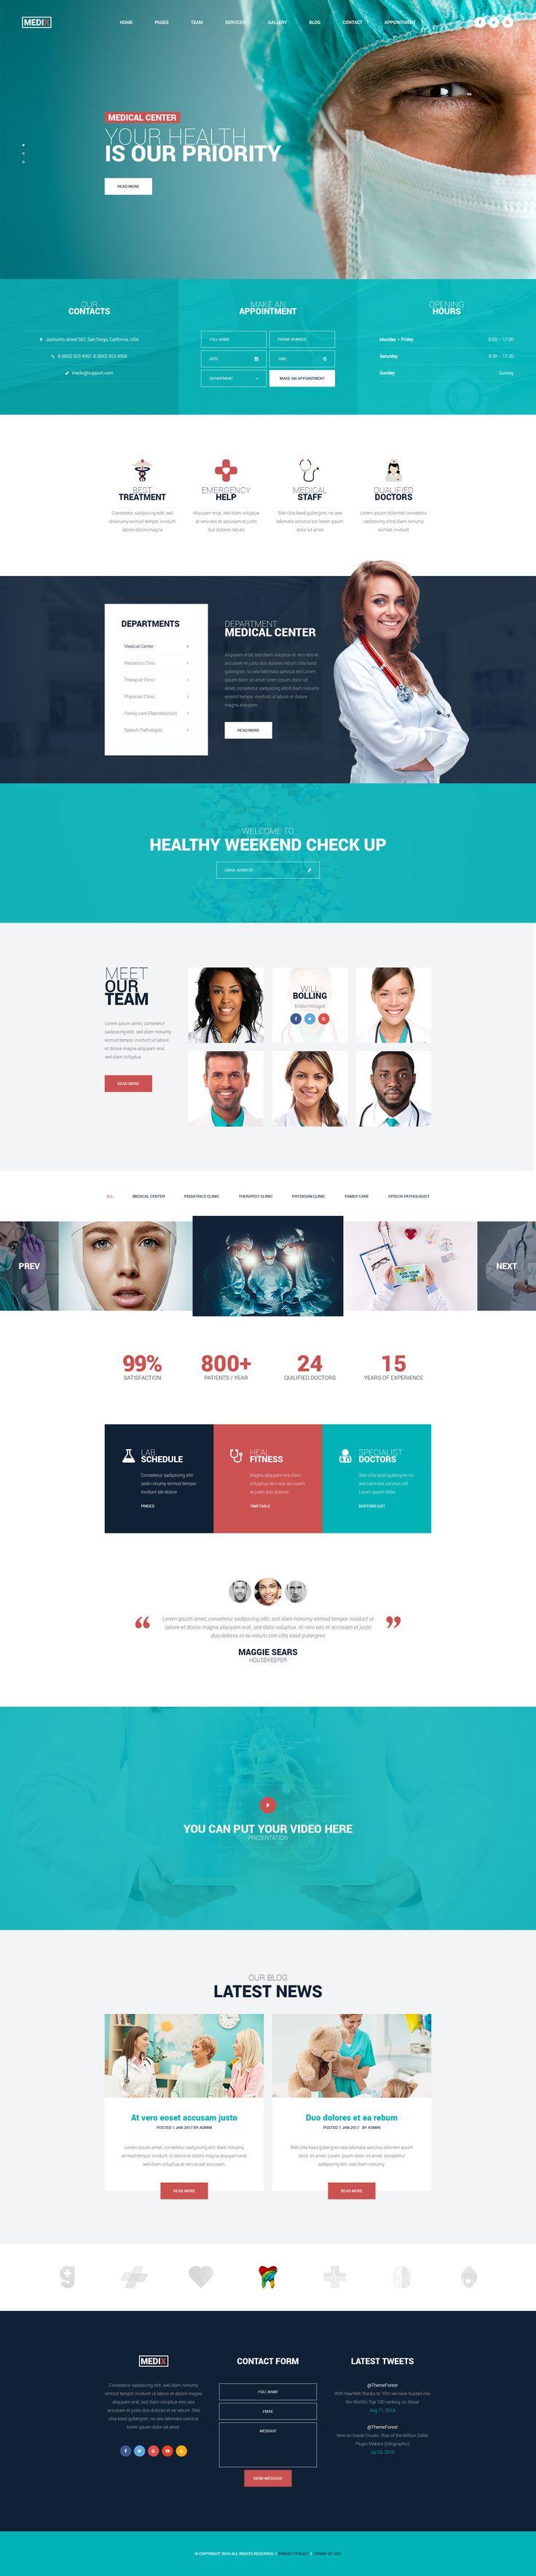 Best 25+ Hospital website ideas on Pinterest